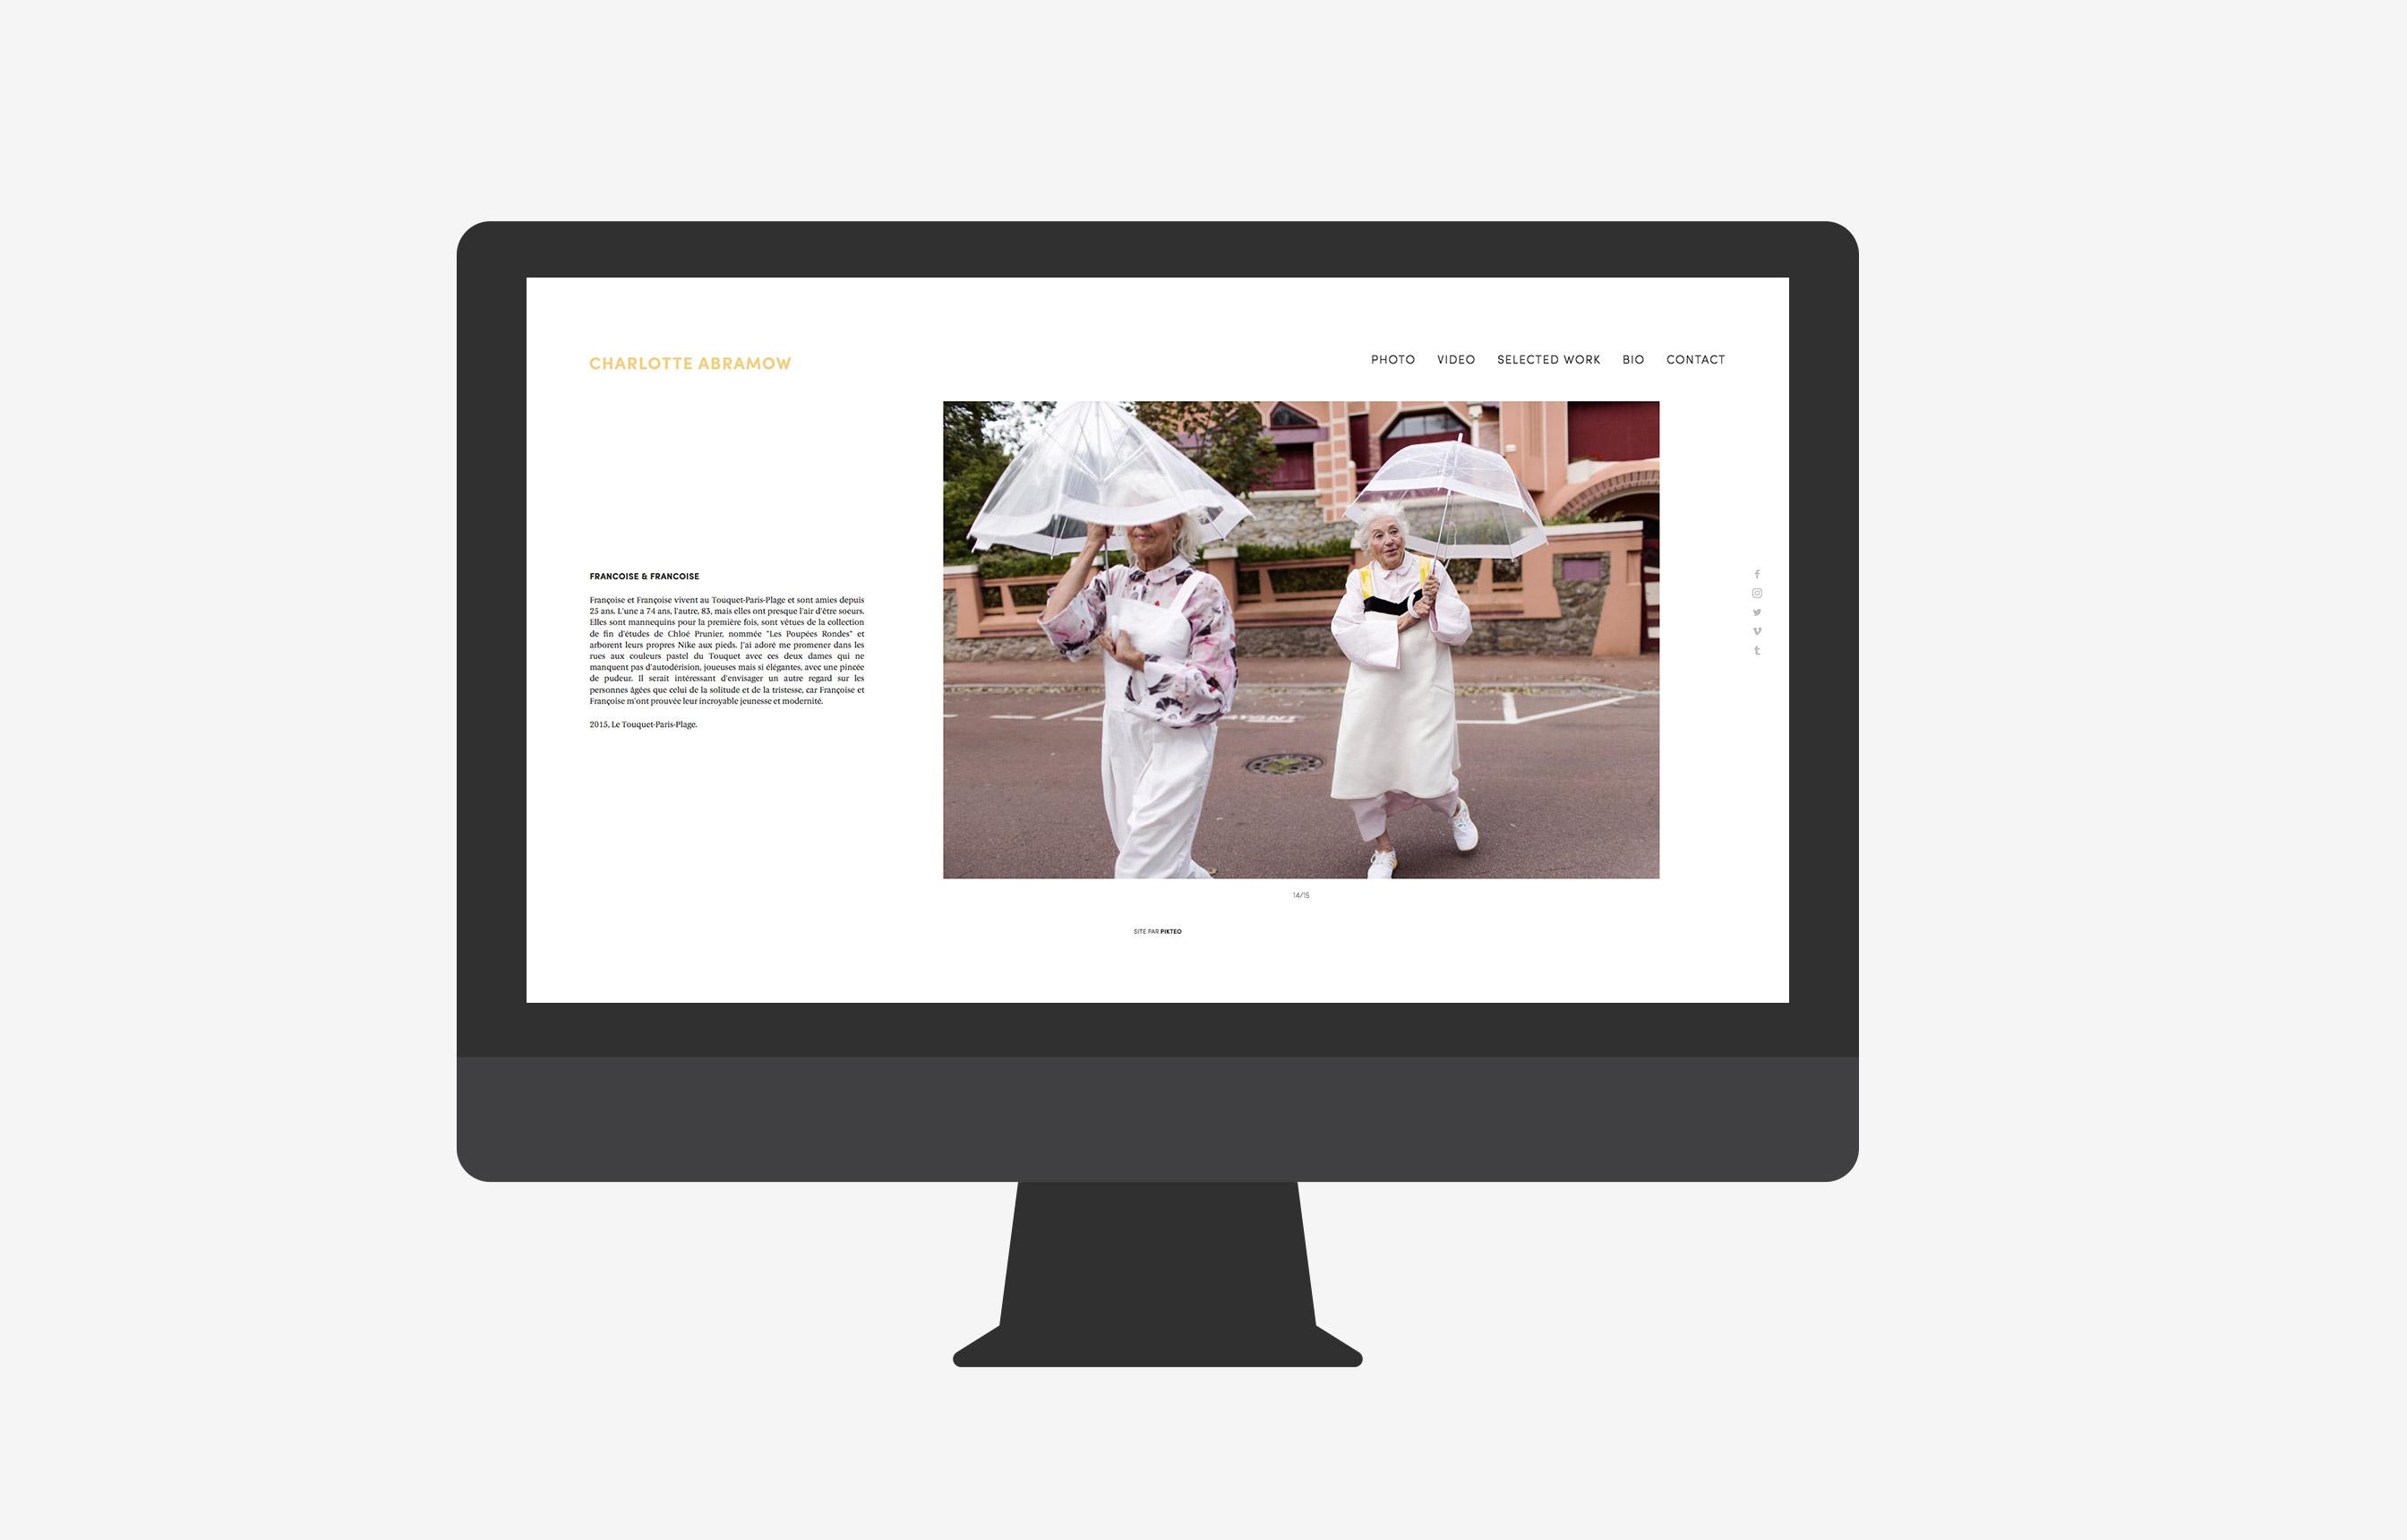 04-charlotte-abramow-pikteo-webdesign-graphic-design-freelance-paris-bruxelles-londres